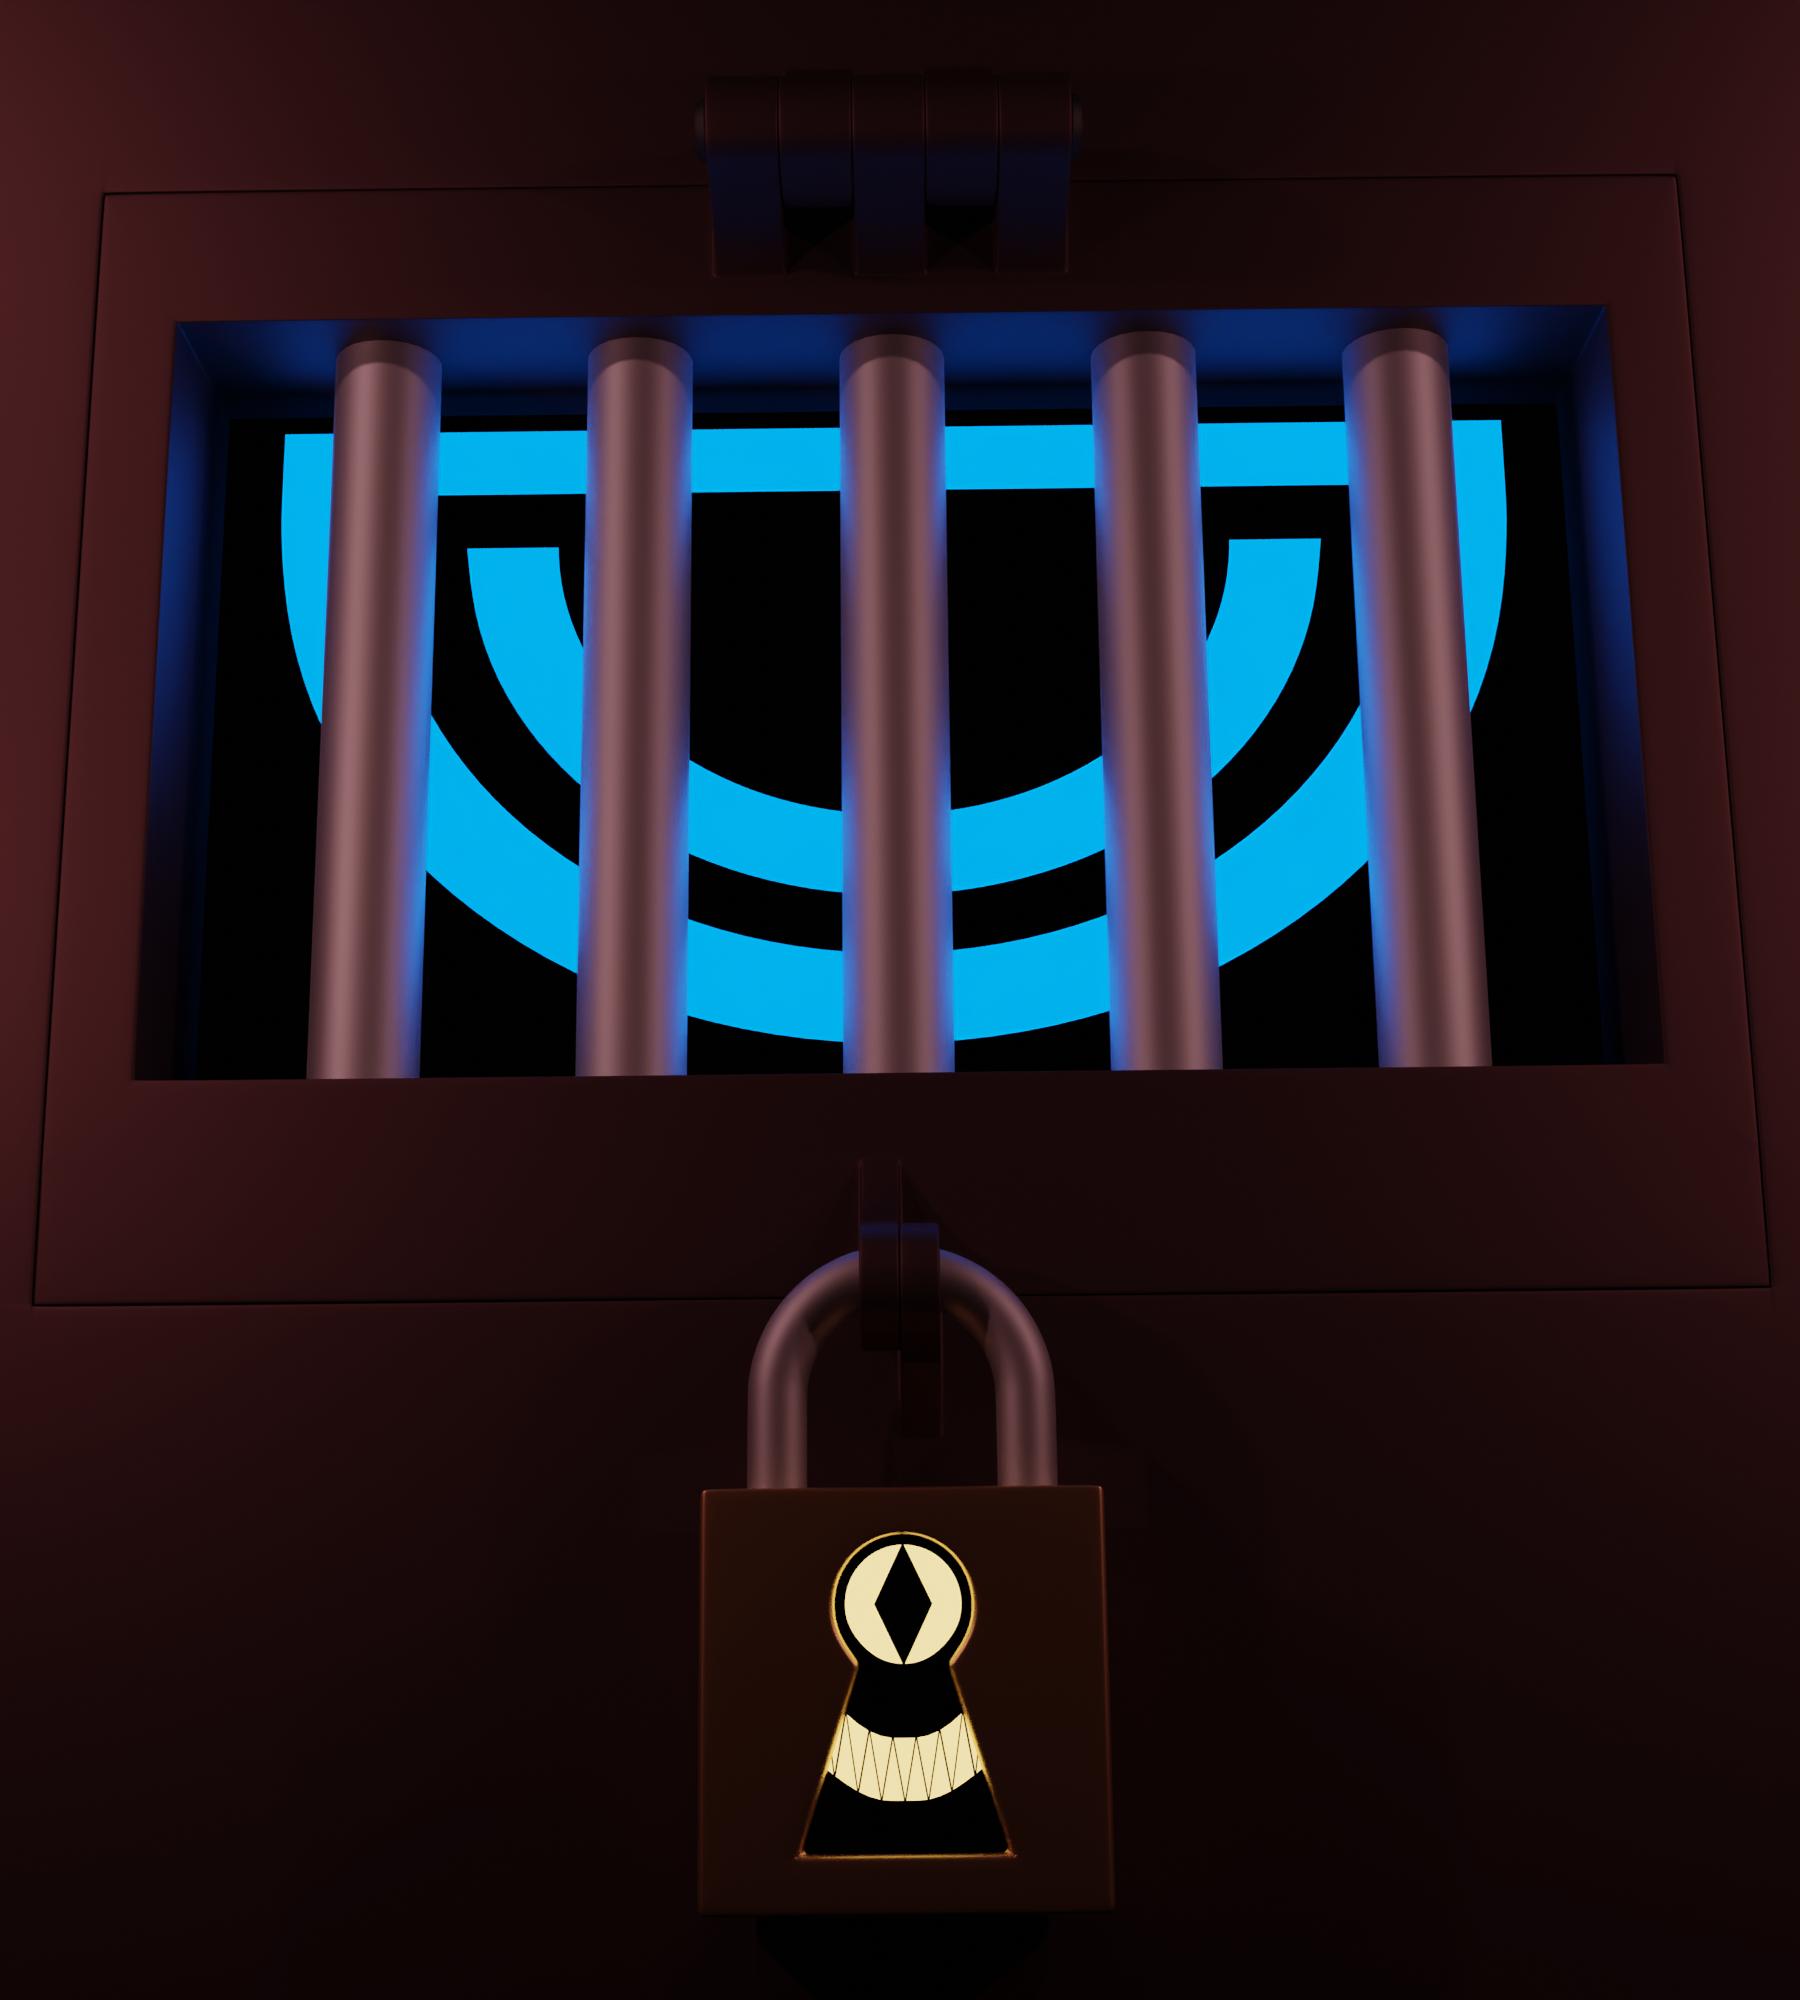 locked up blue eye